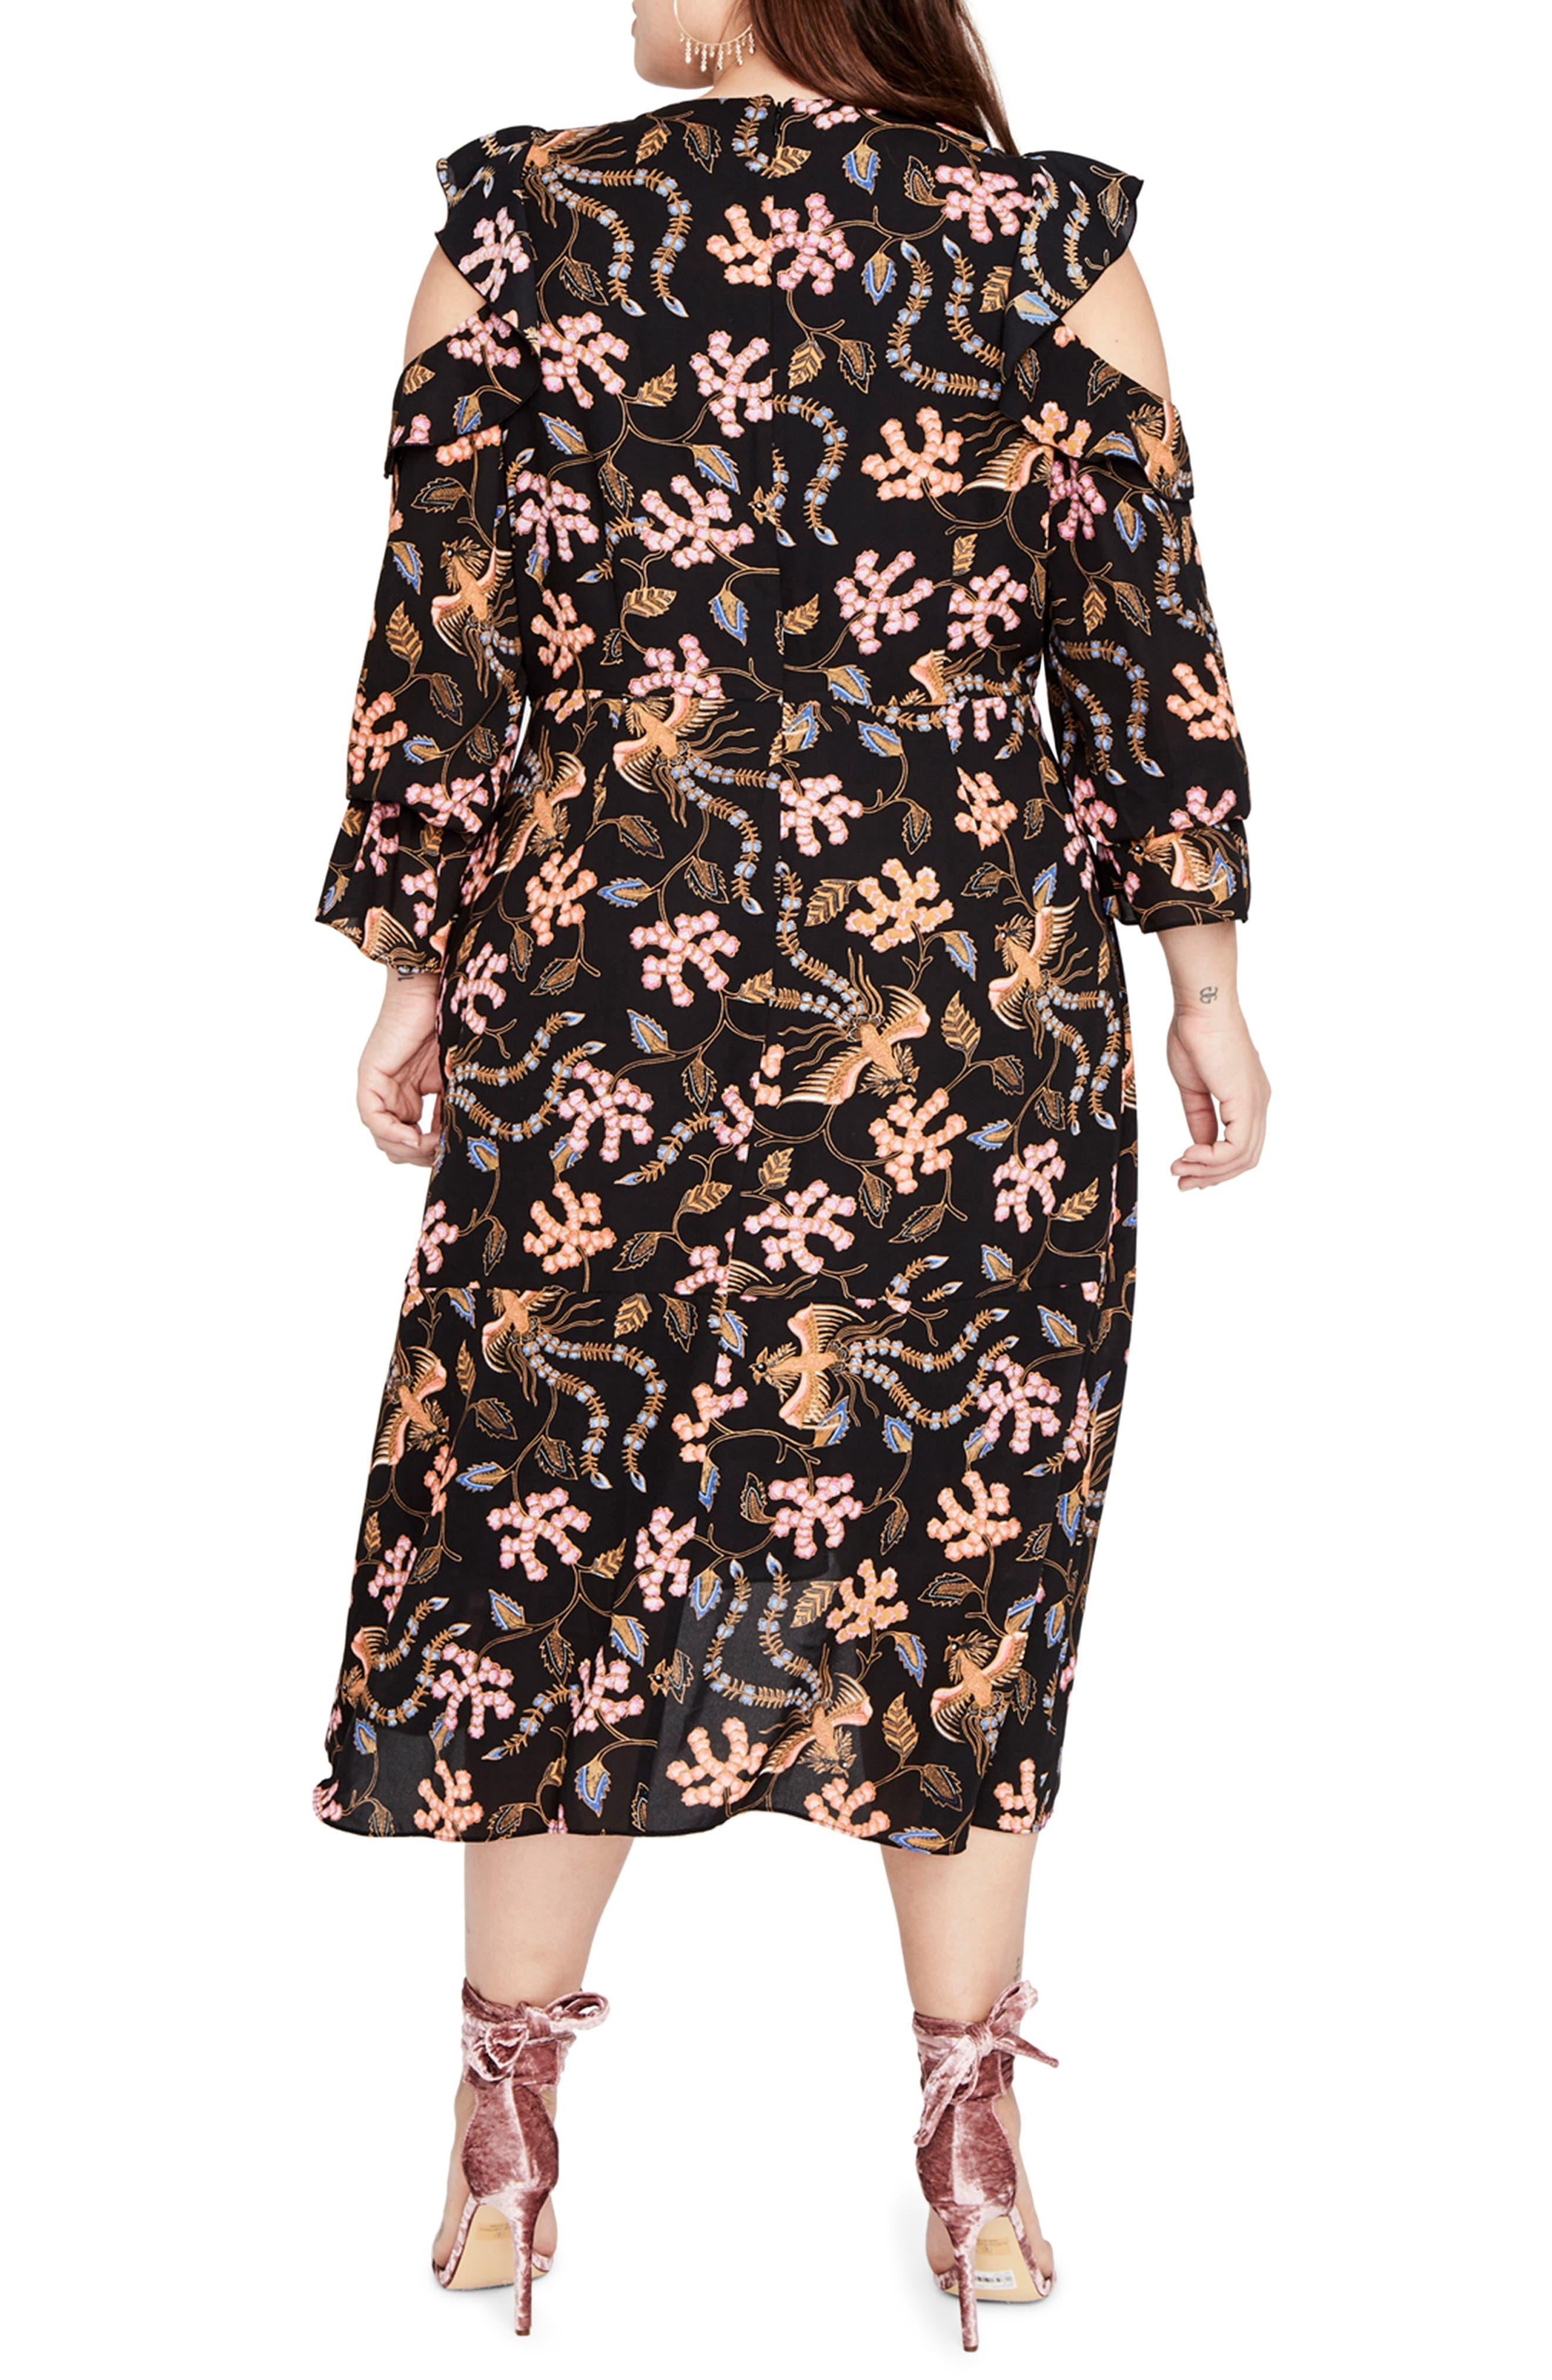 RACHEL BY Rachel Roy Cold Shoulder Ruffle Midi Dress,                             Alternate thumbnail 2, color,                             Black Multi